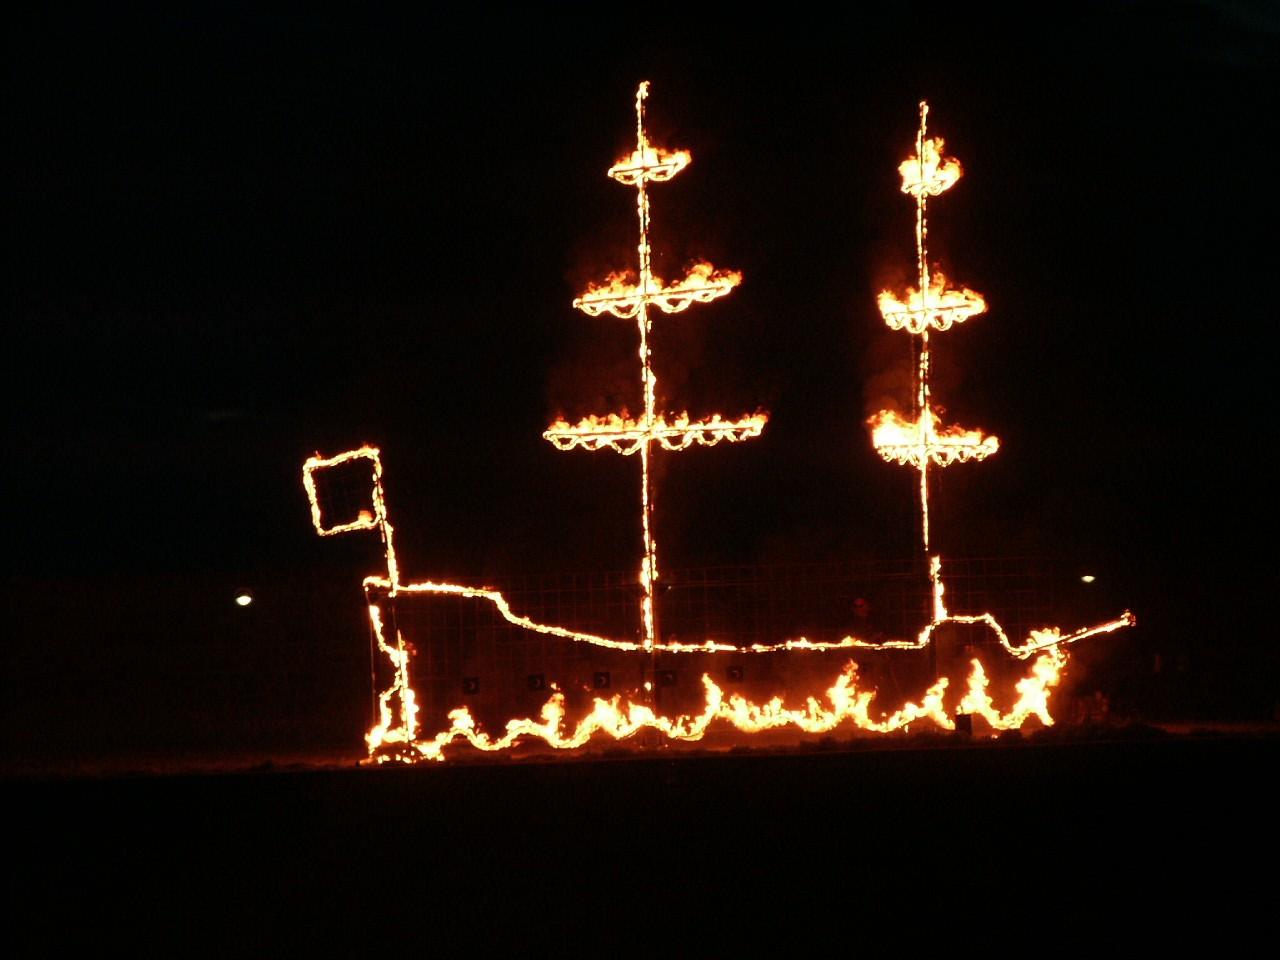 firedrawing - ship close up.jpg